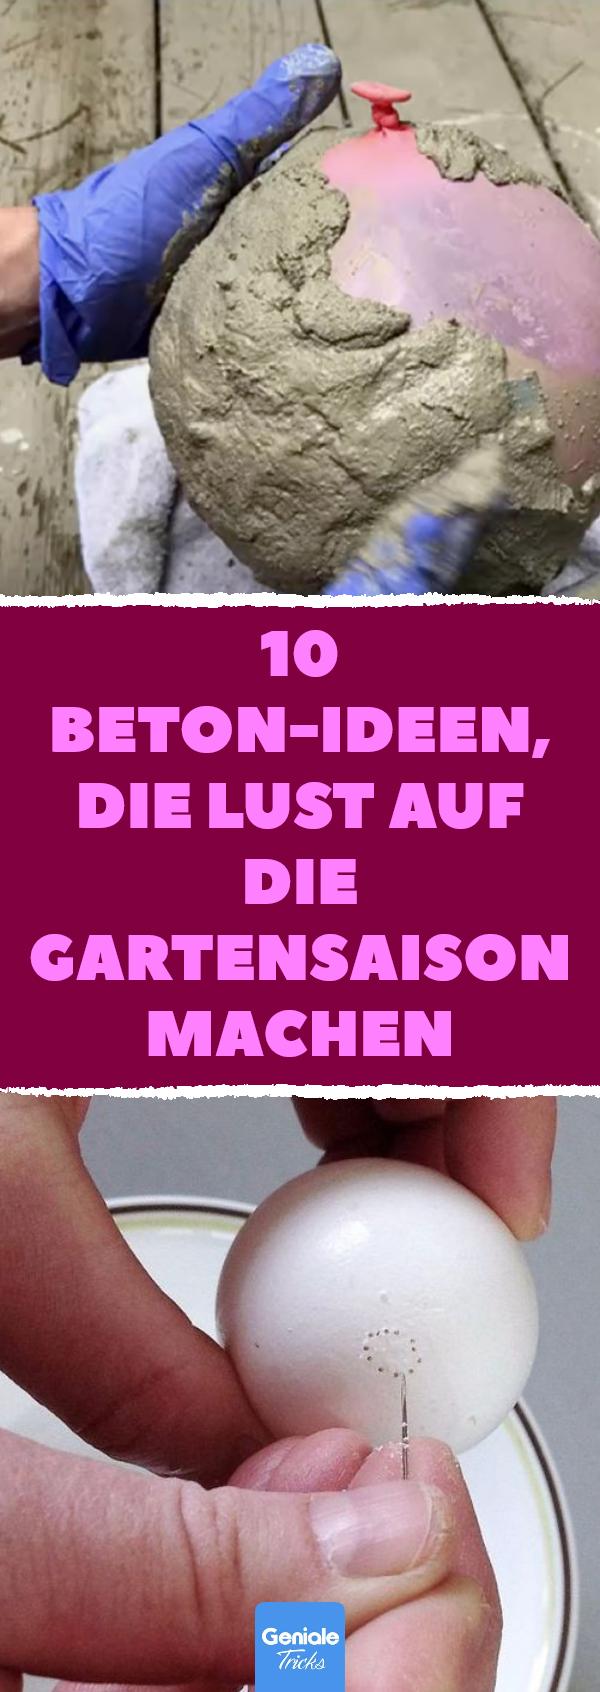 Photo of 10 concrete ideas that make you want to start the gardening season